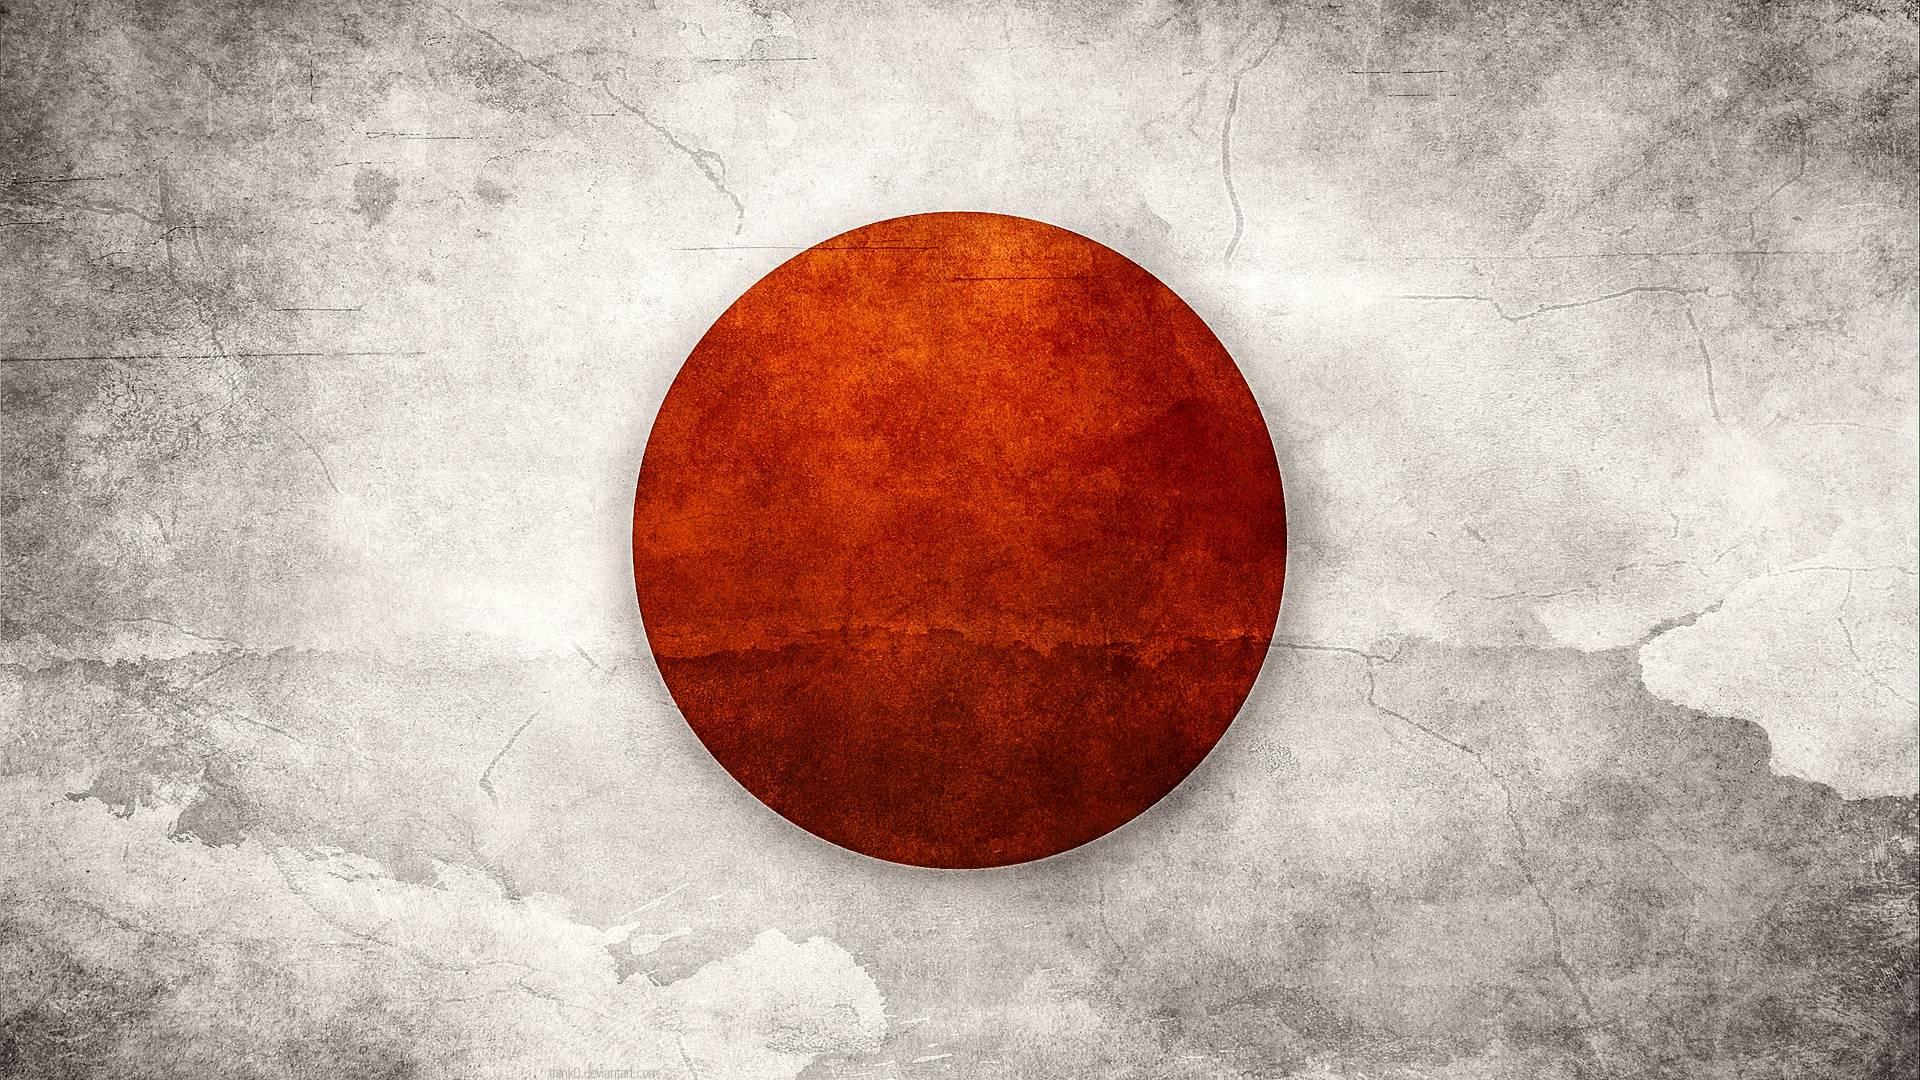 Hd wallpaper japan - Japan Flag Wallpaper Free 13524 Wallpaper Aws Hd Wallpapers